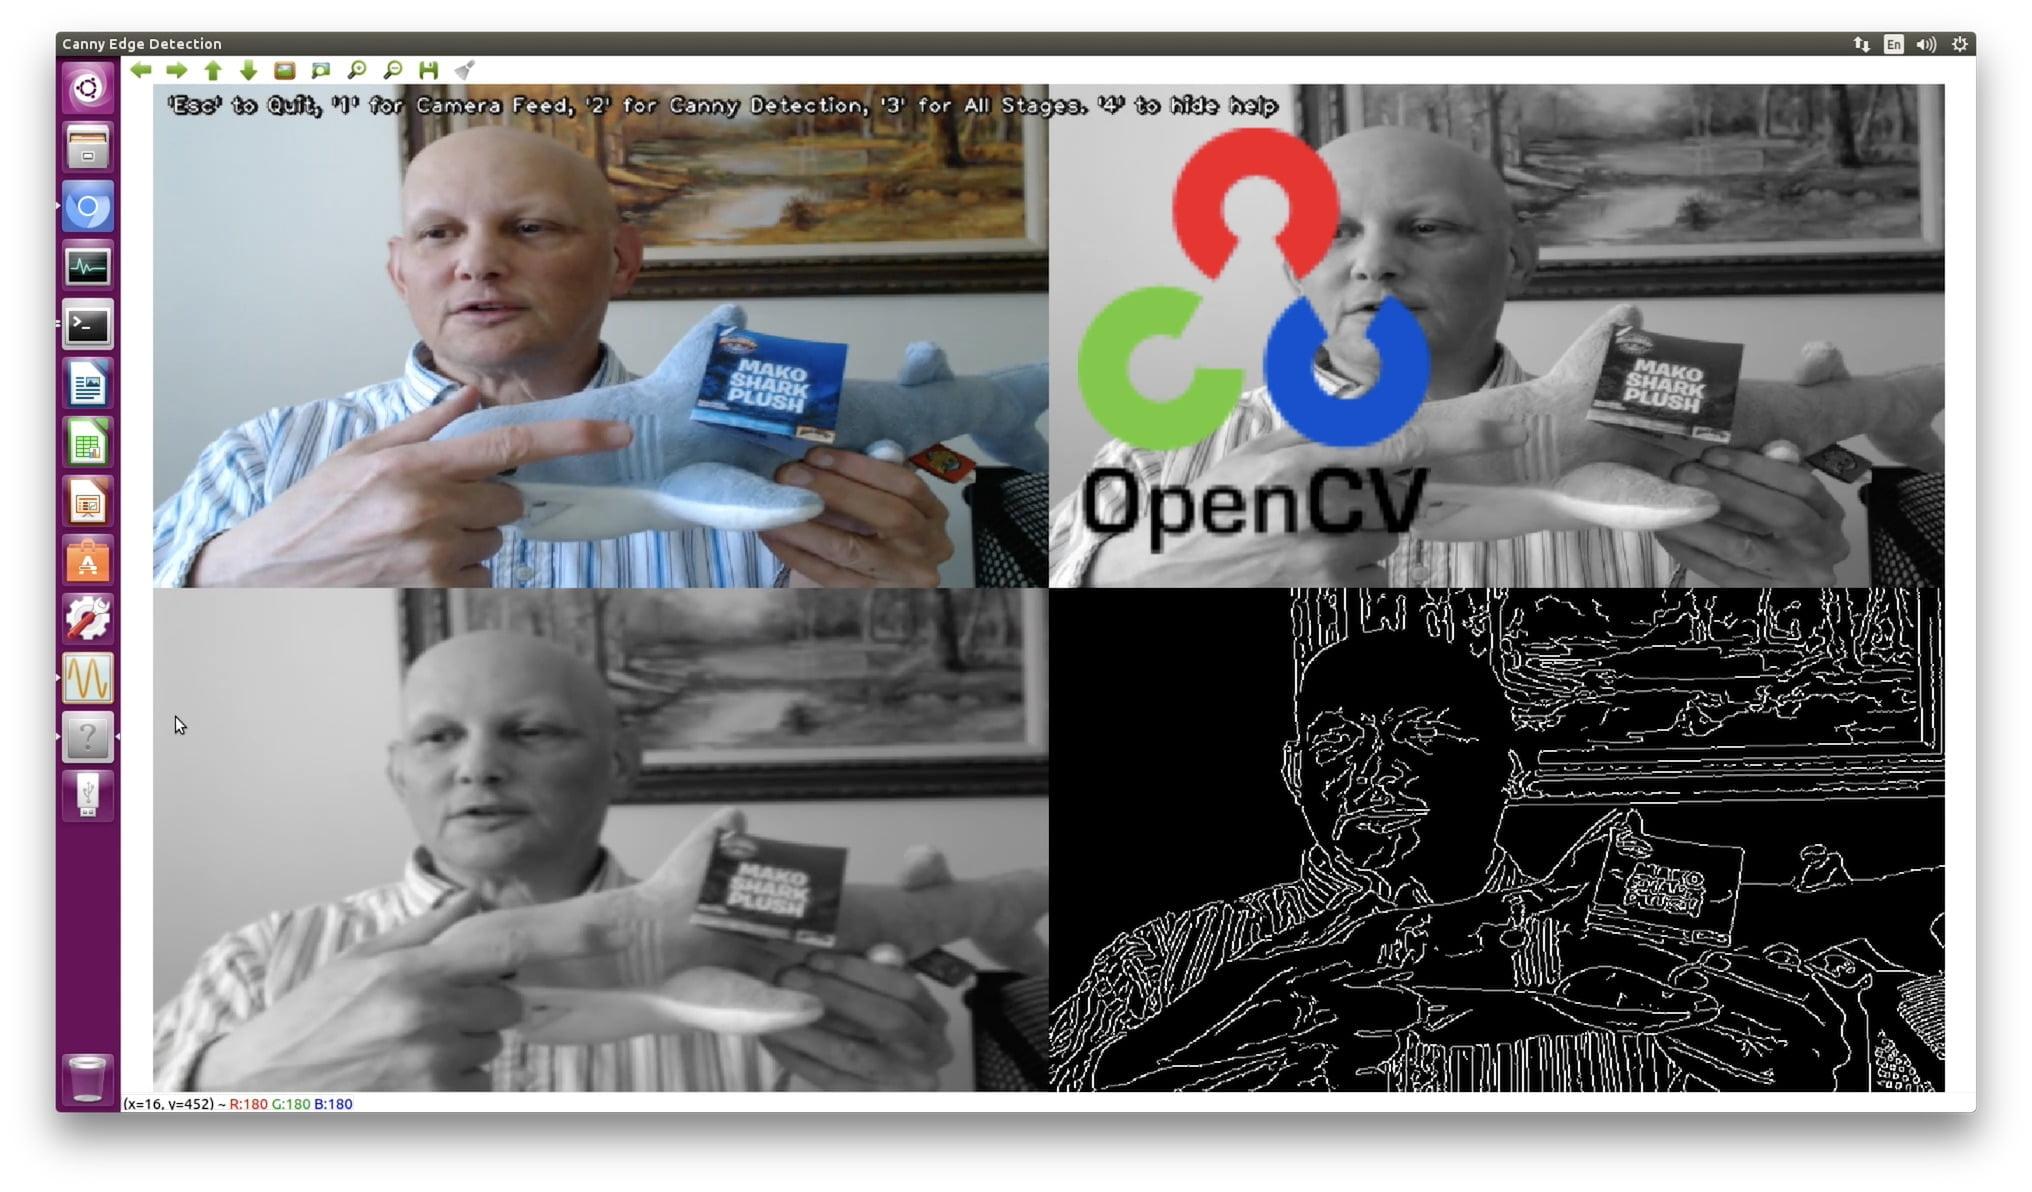 Jetsonhacks — Build OpenCV 3 4 with CUDA on NVIDIA Jetson TX1